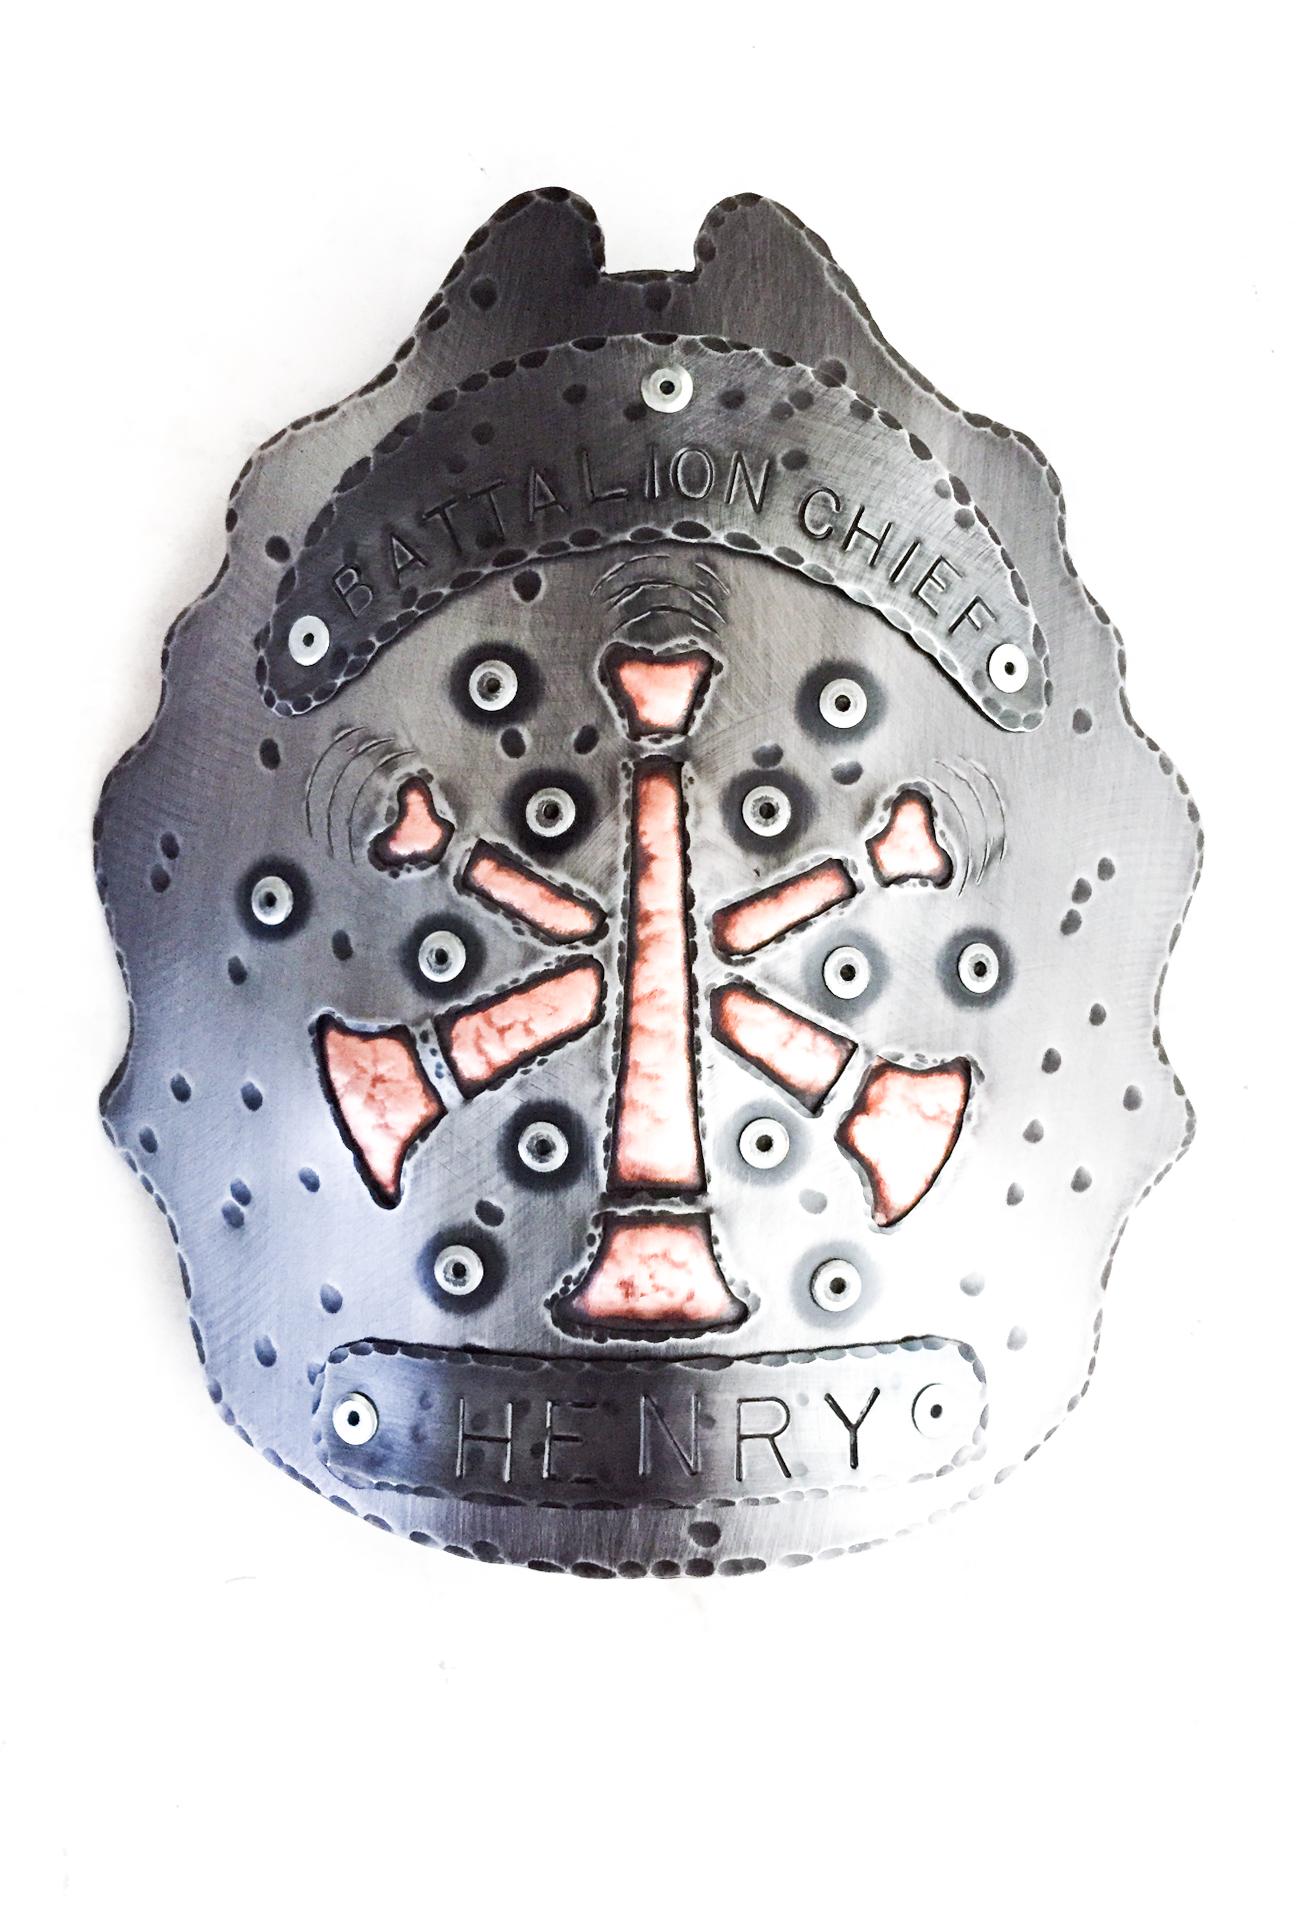 Shields by Nick-14.jpg